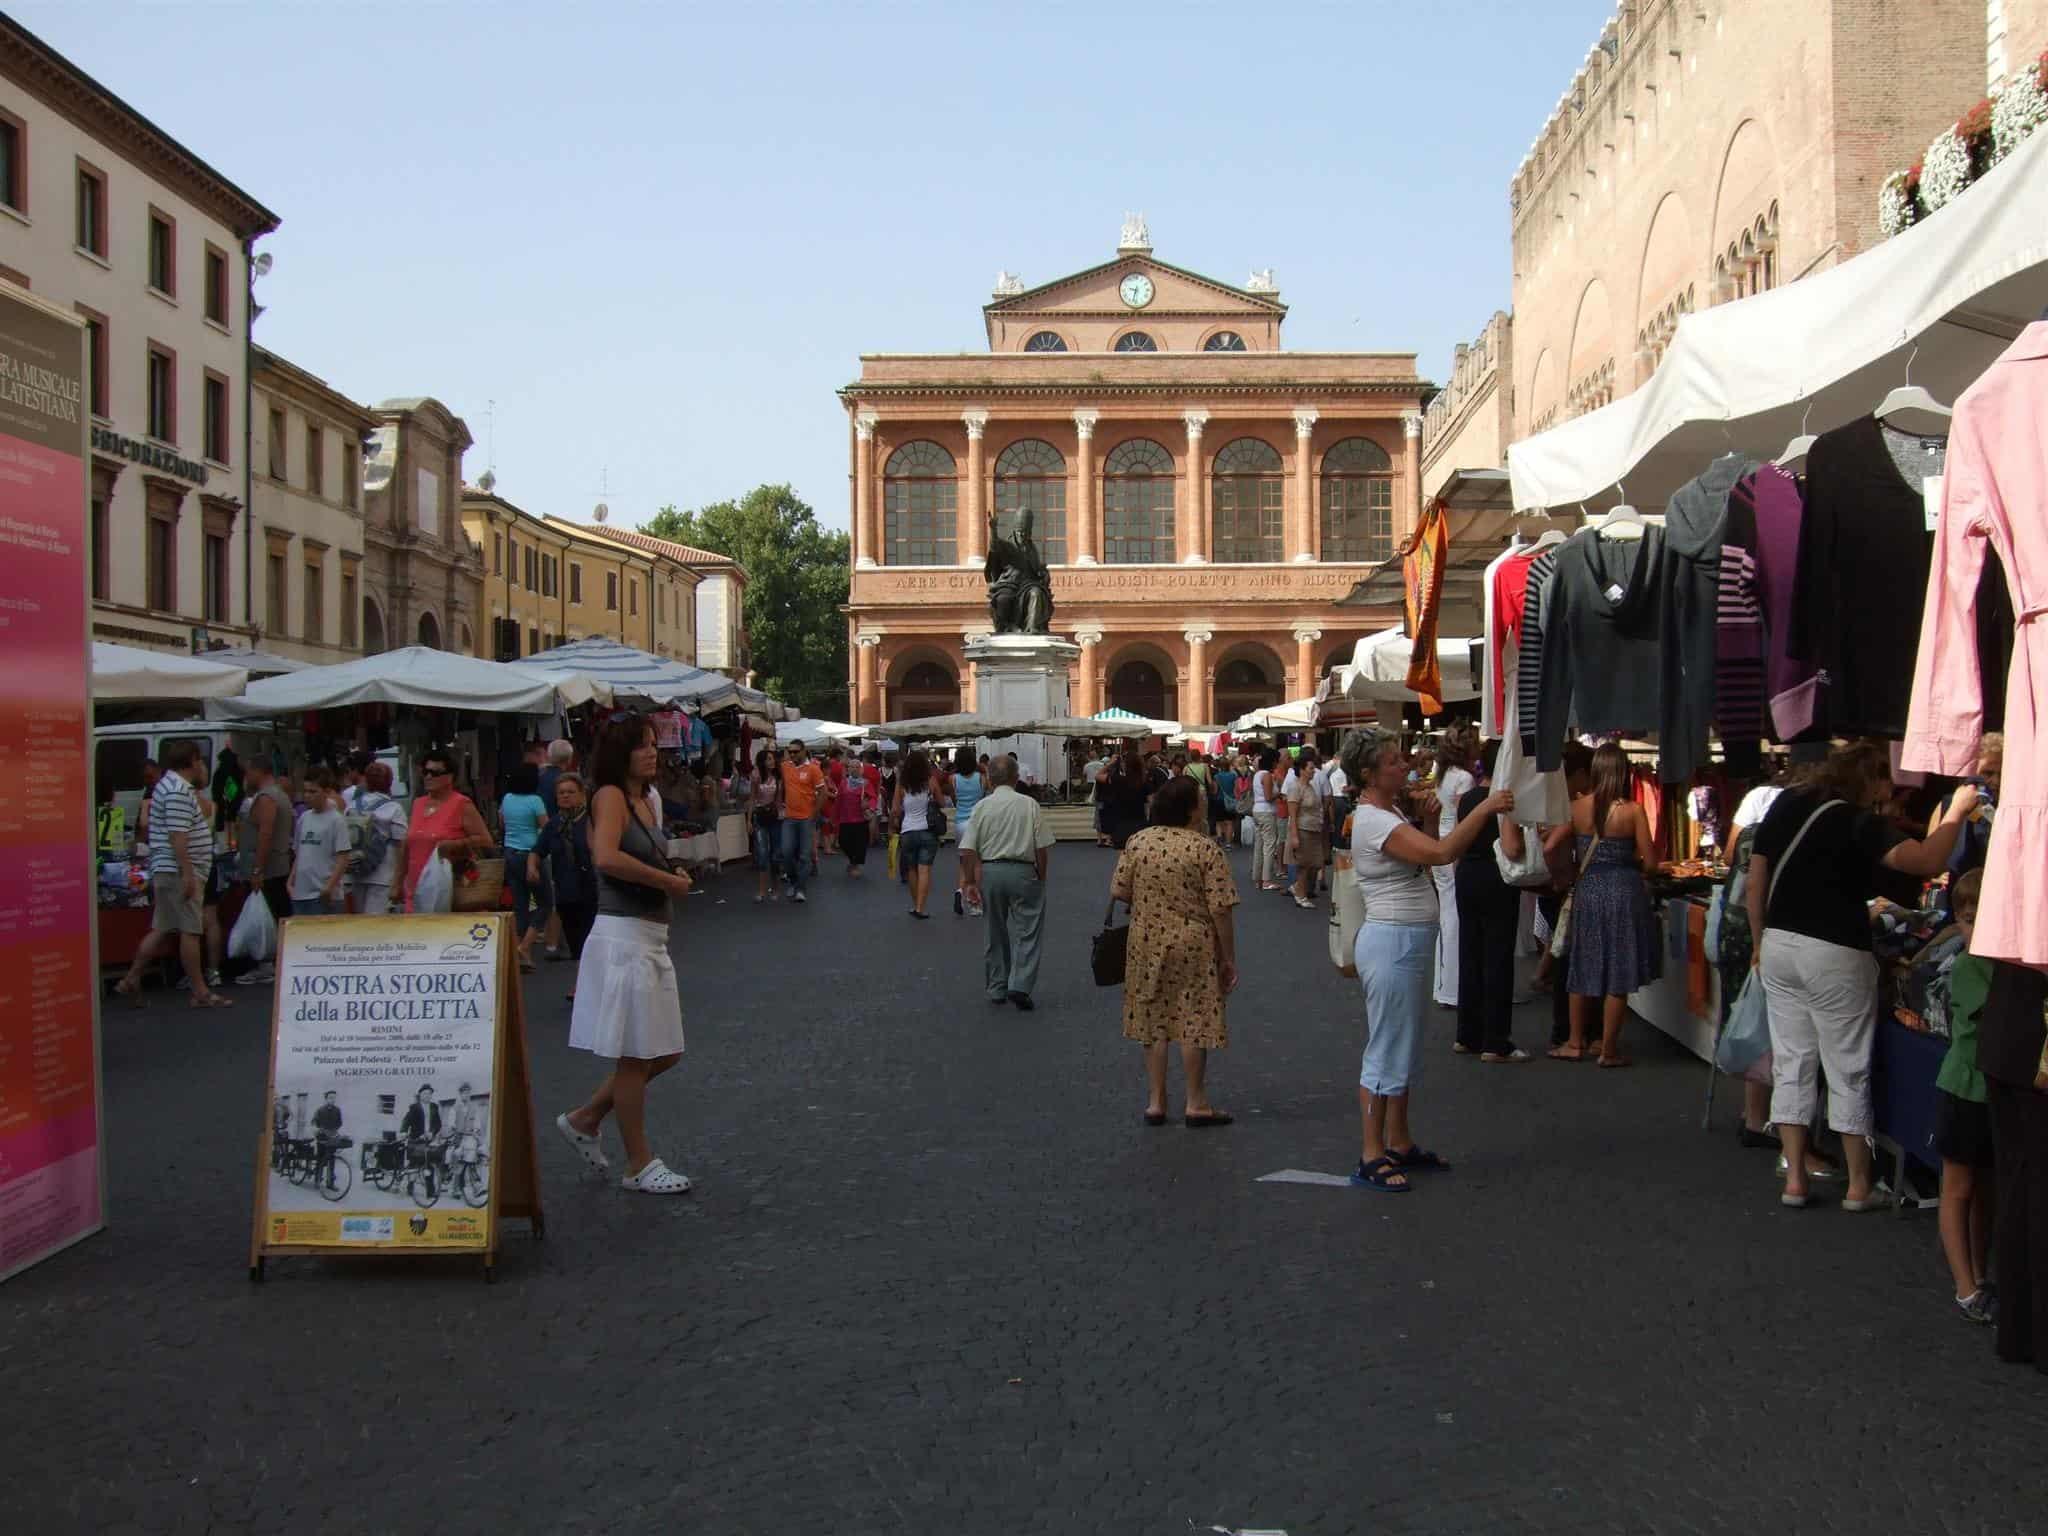 Markt in der Altstadt von Rimini